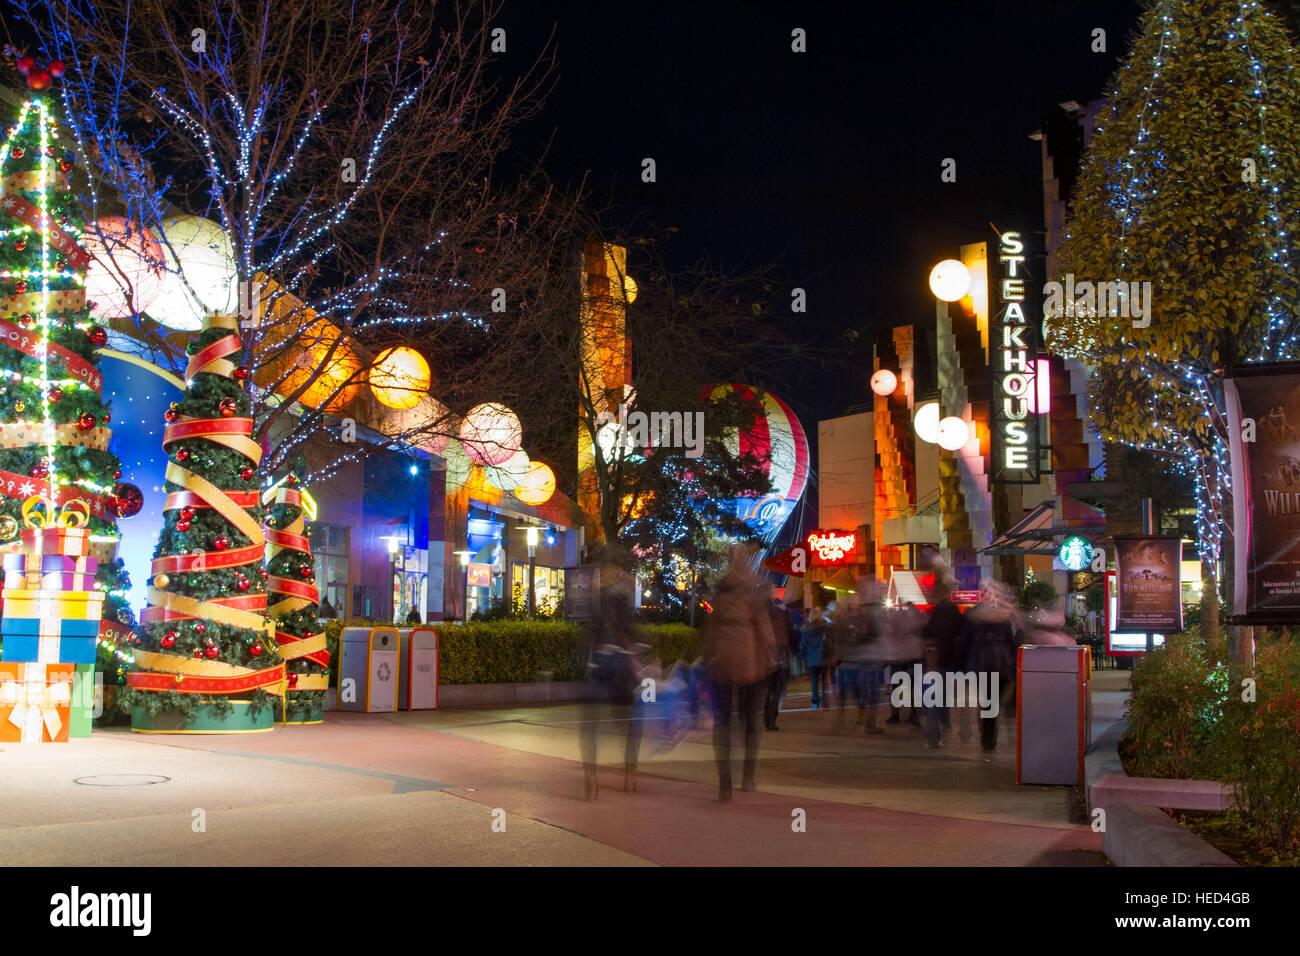 Disney Village at Christmas Stock Photo